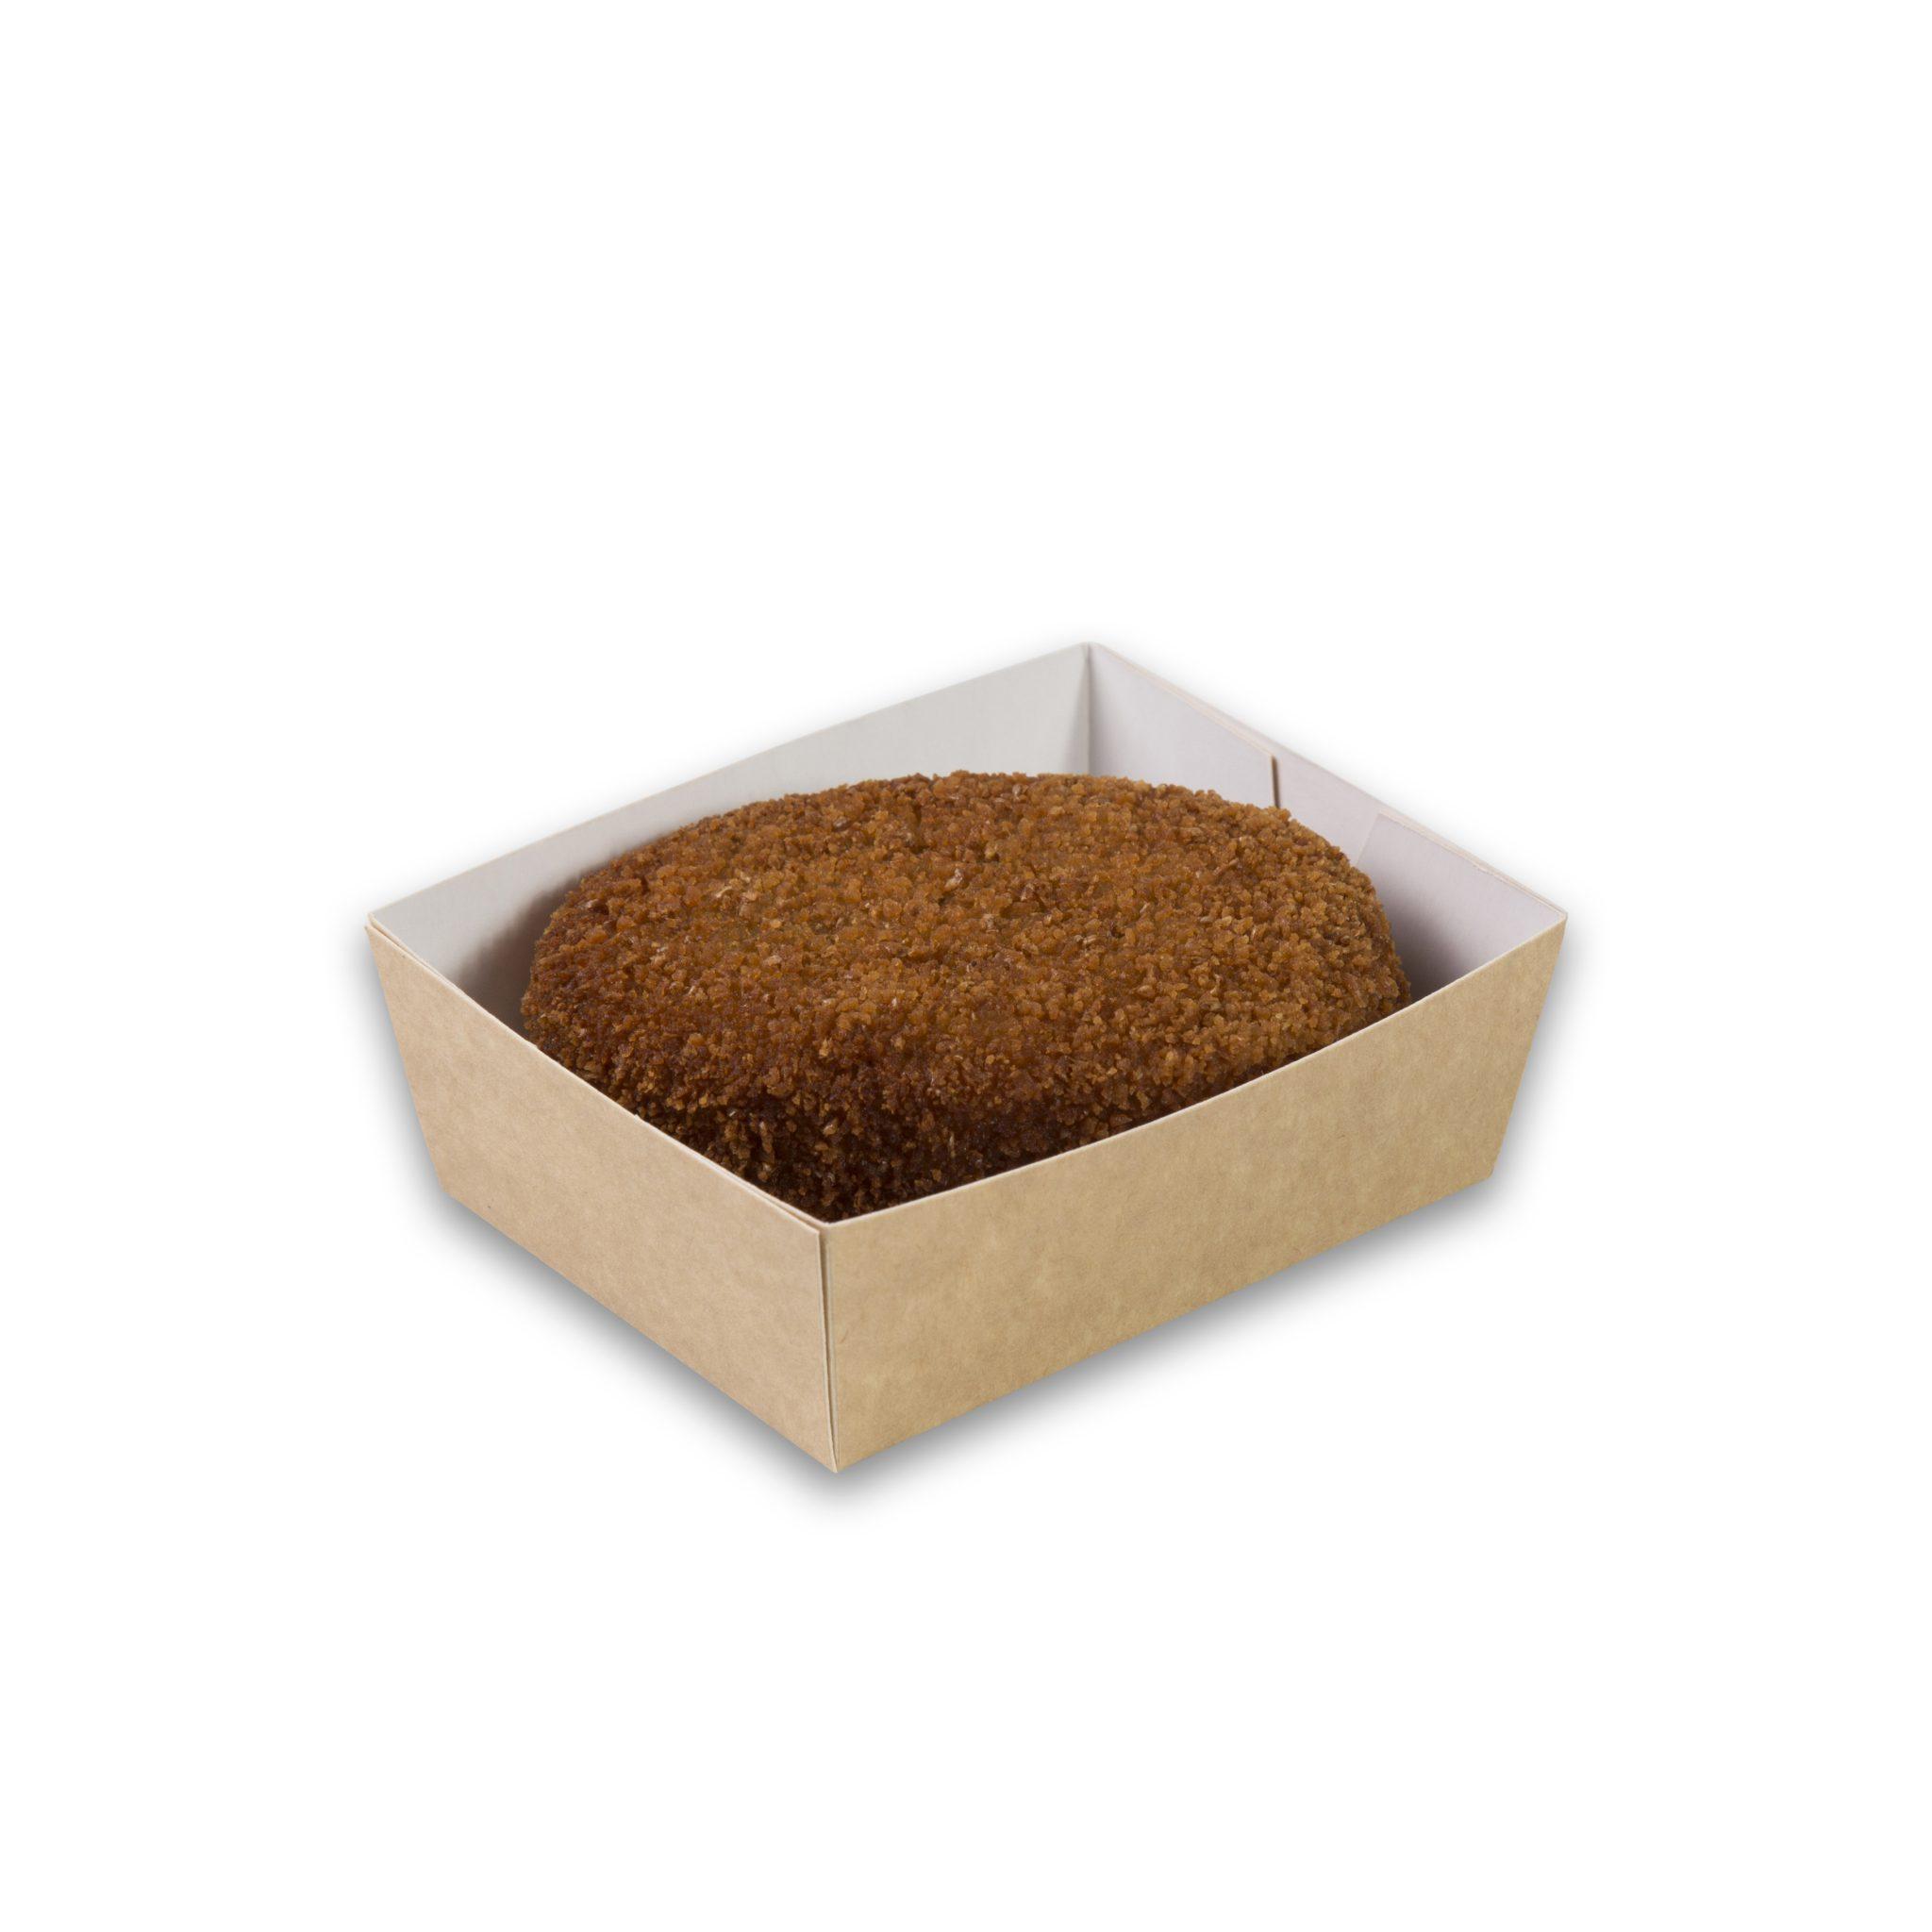 Kraft karton snackbakje A2 small 90x70x35 mm snackverpakking